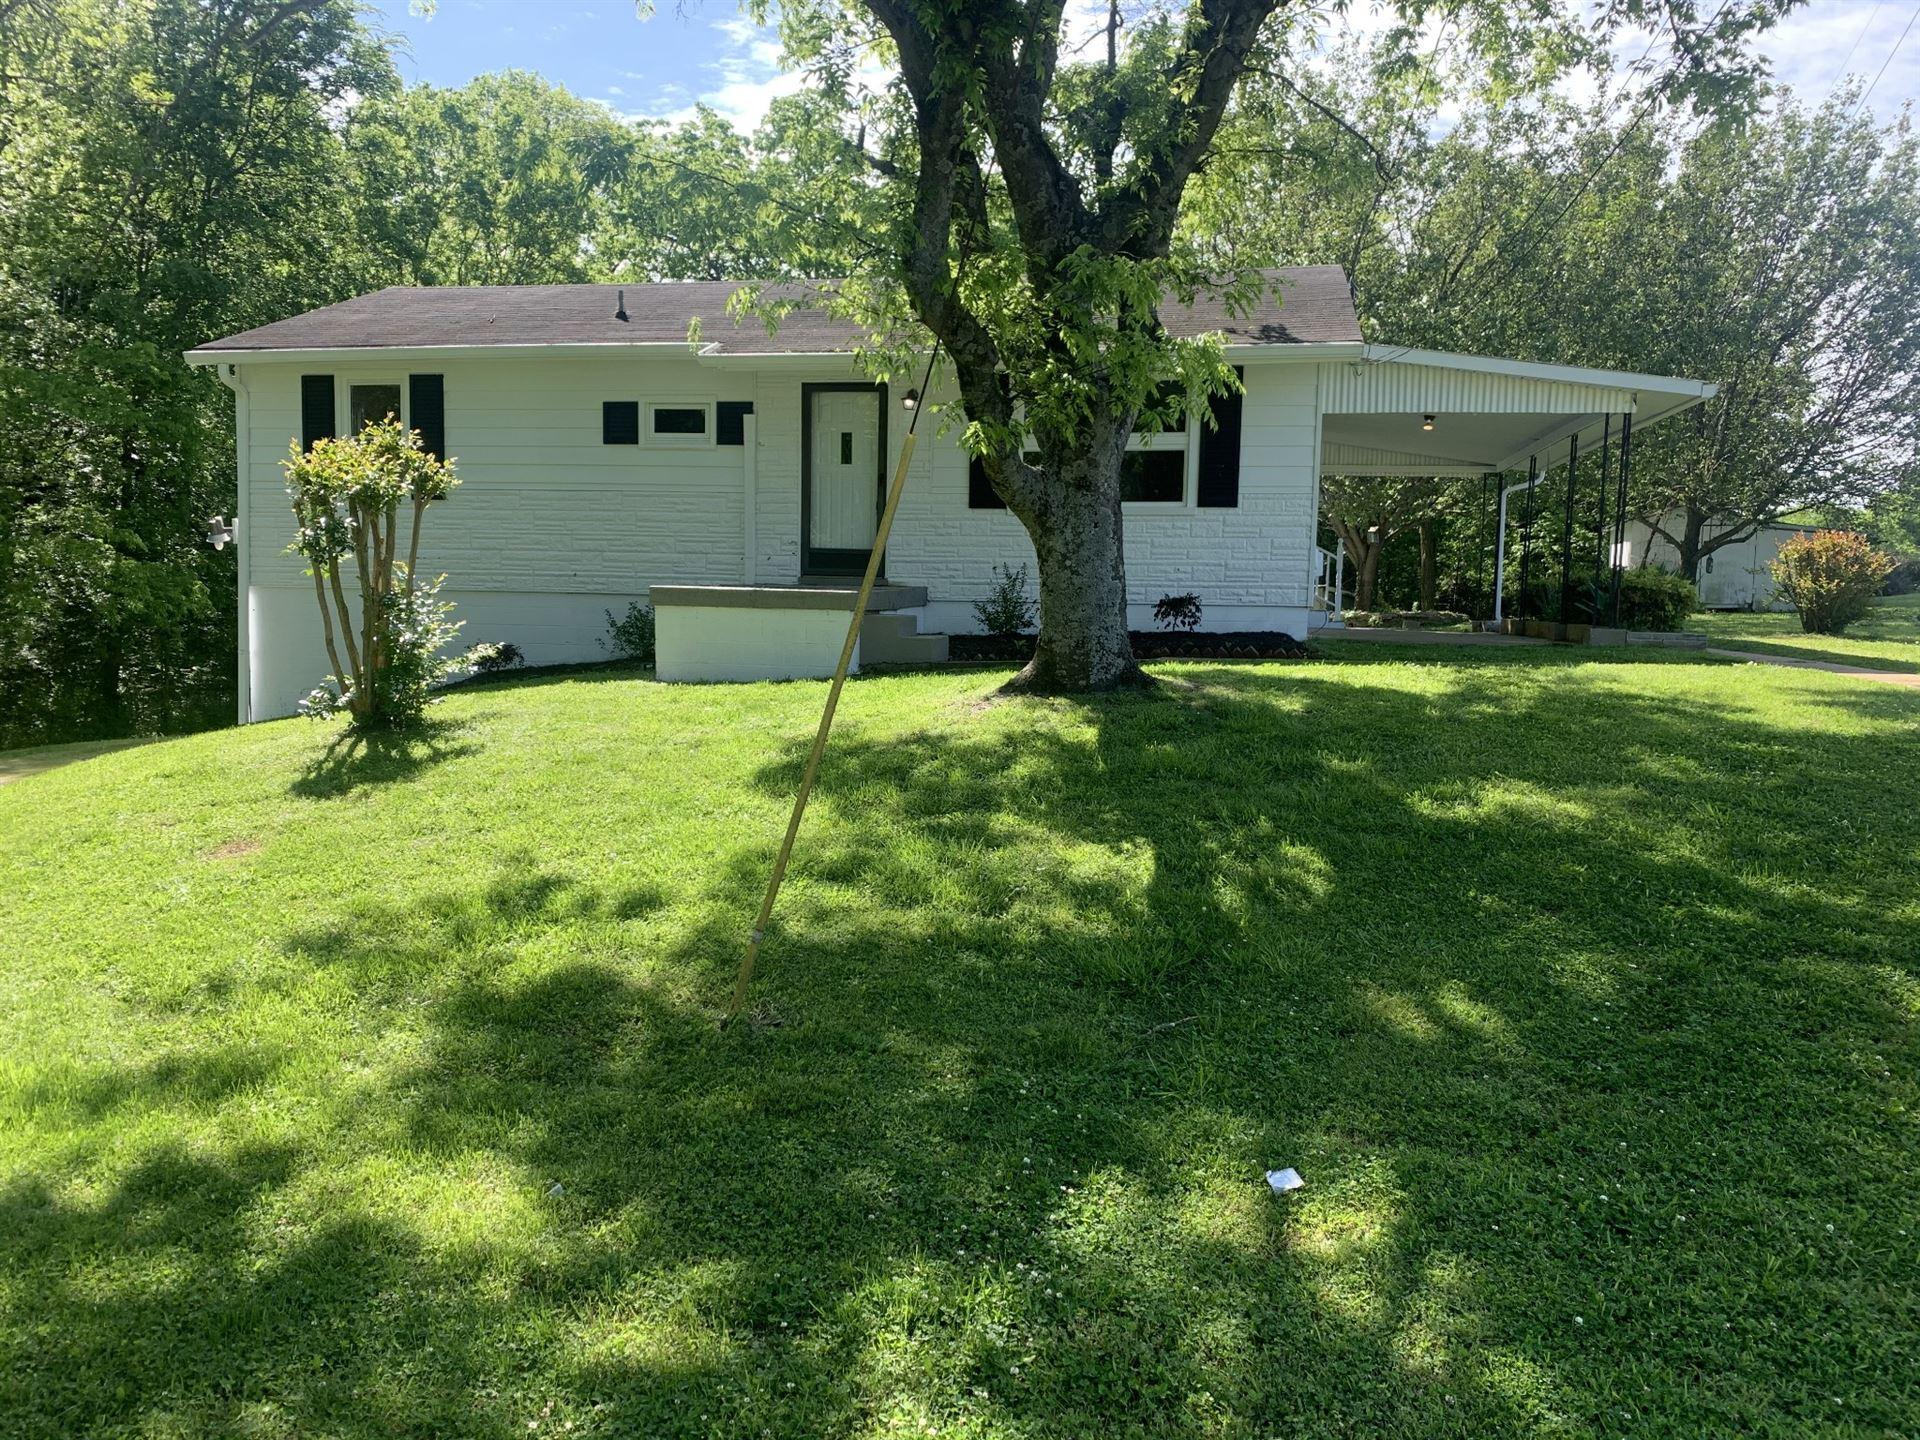 130 Highland St, La Vergne, TN 37086 - MLS#: 2254324